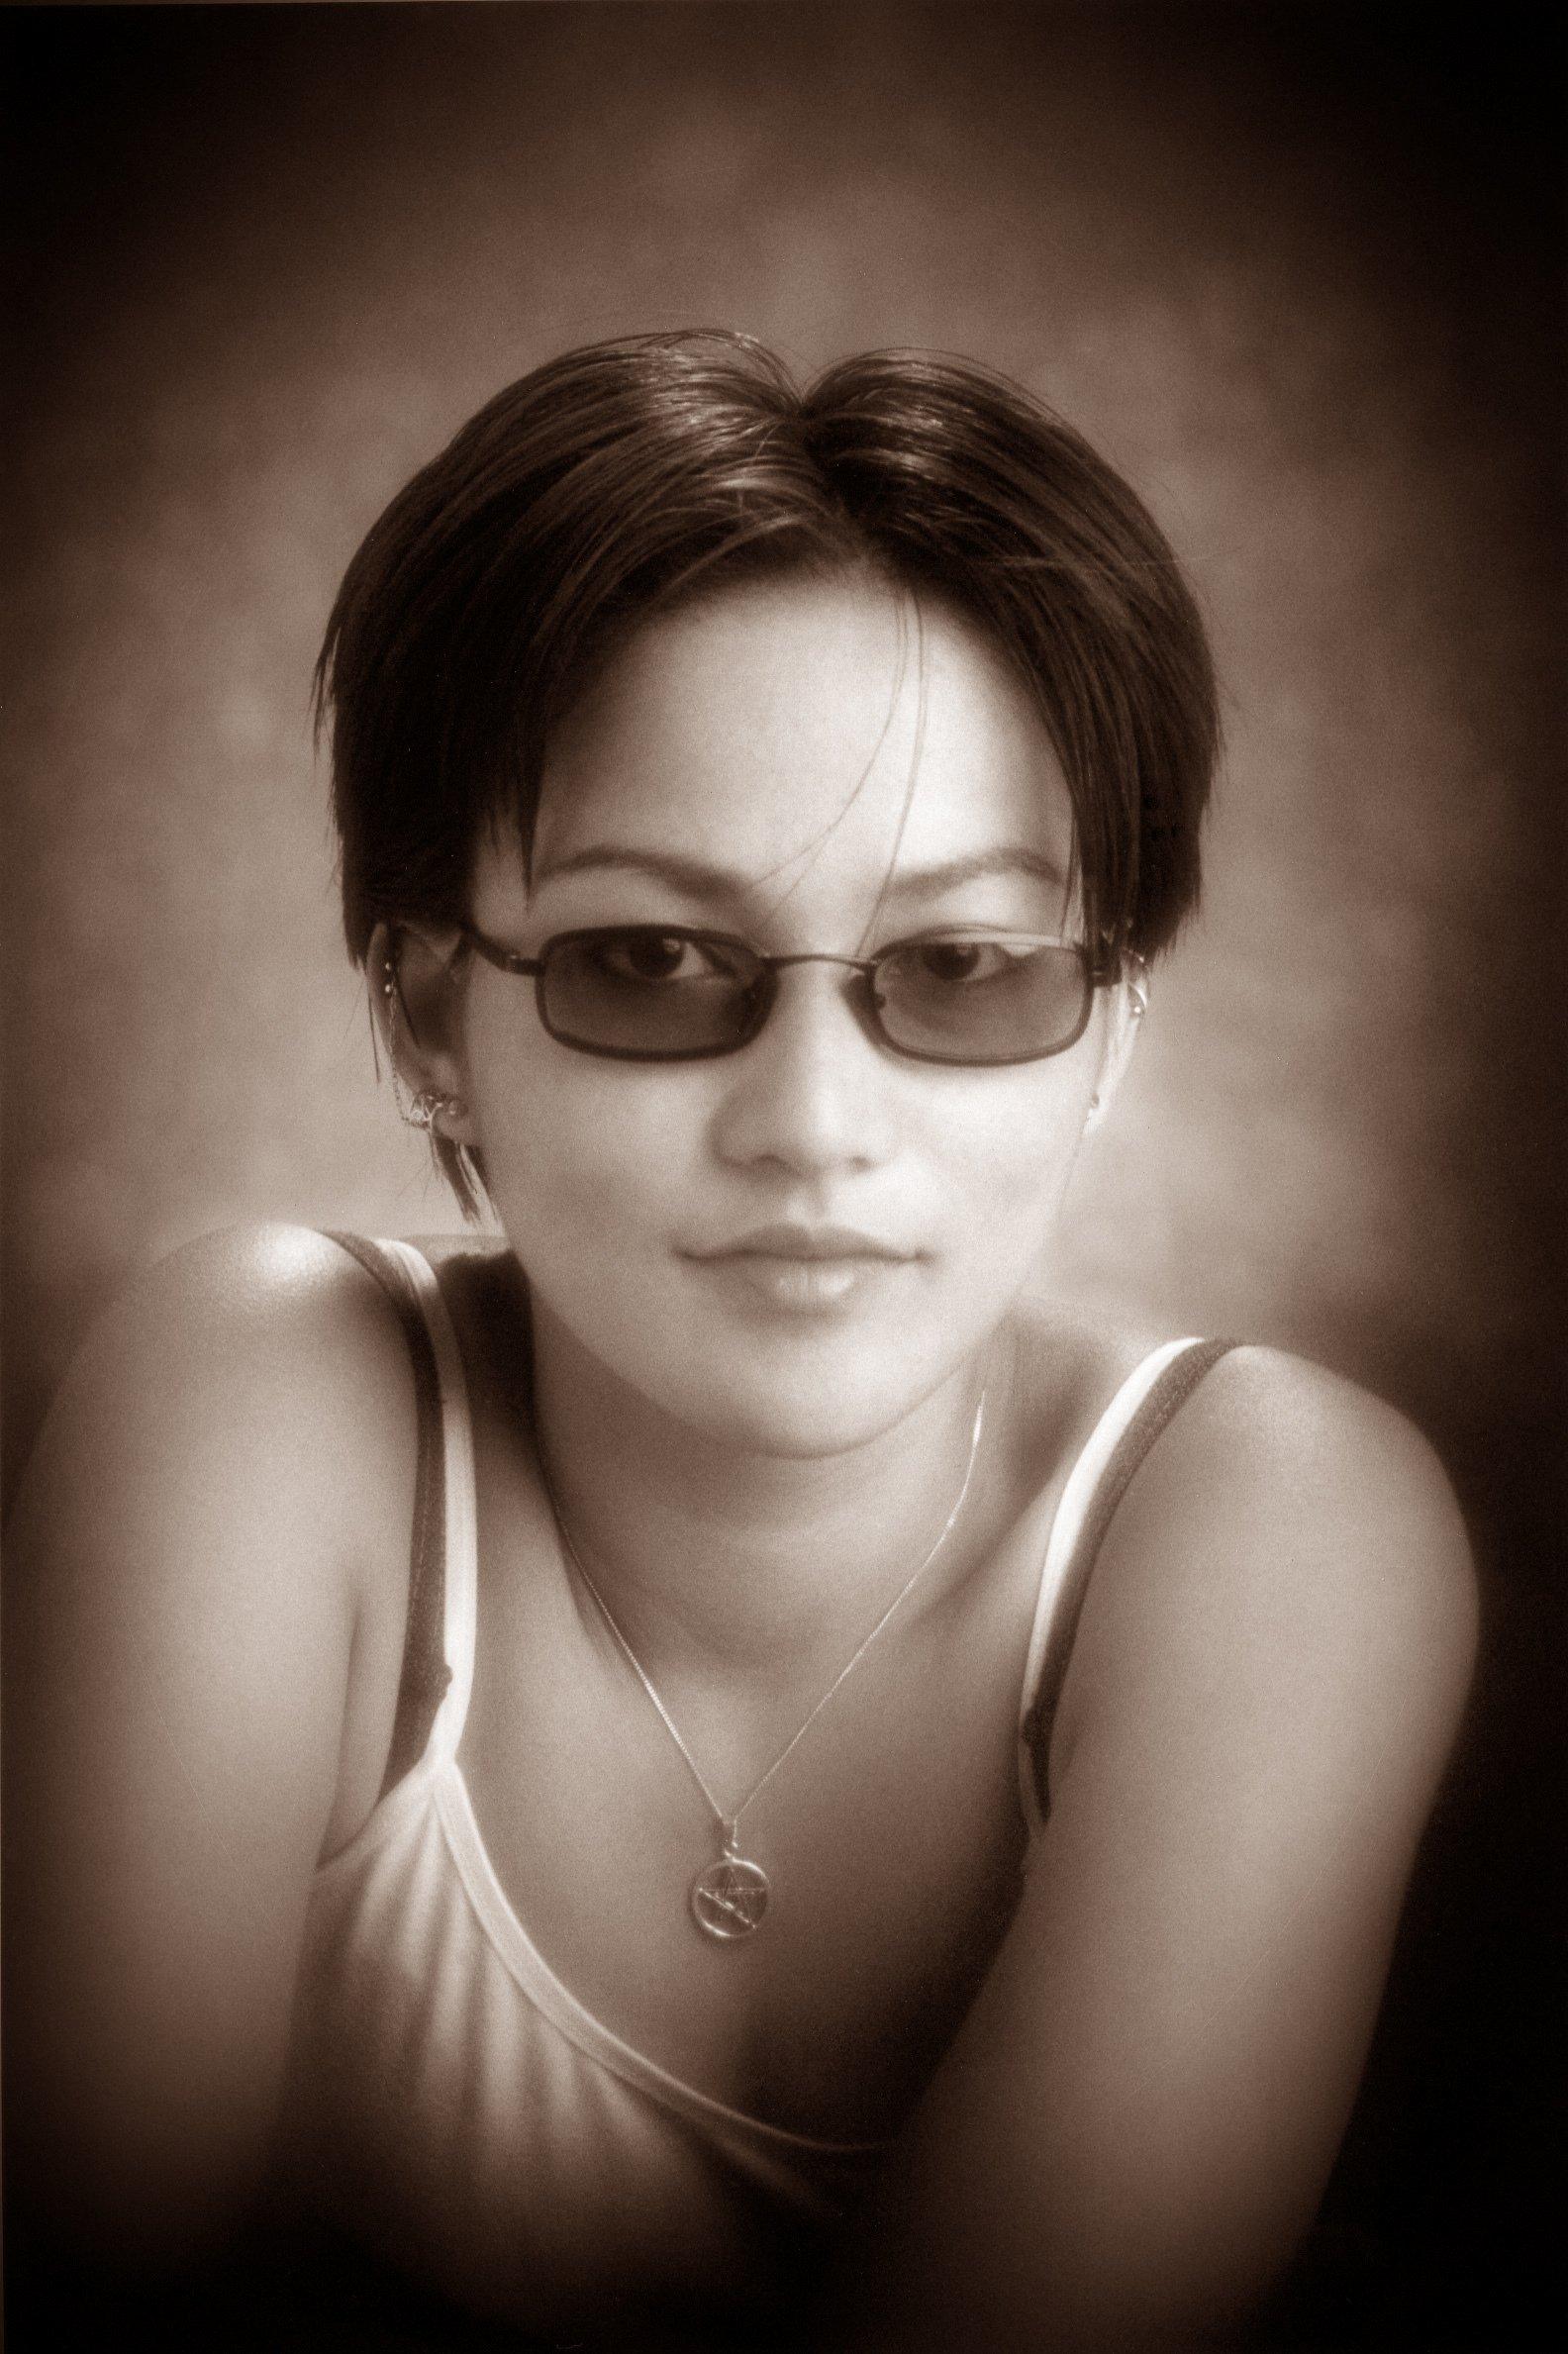 Individual portrait